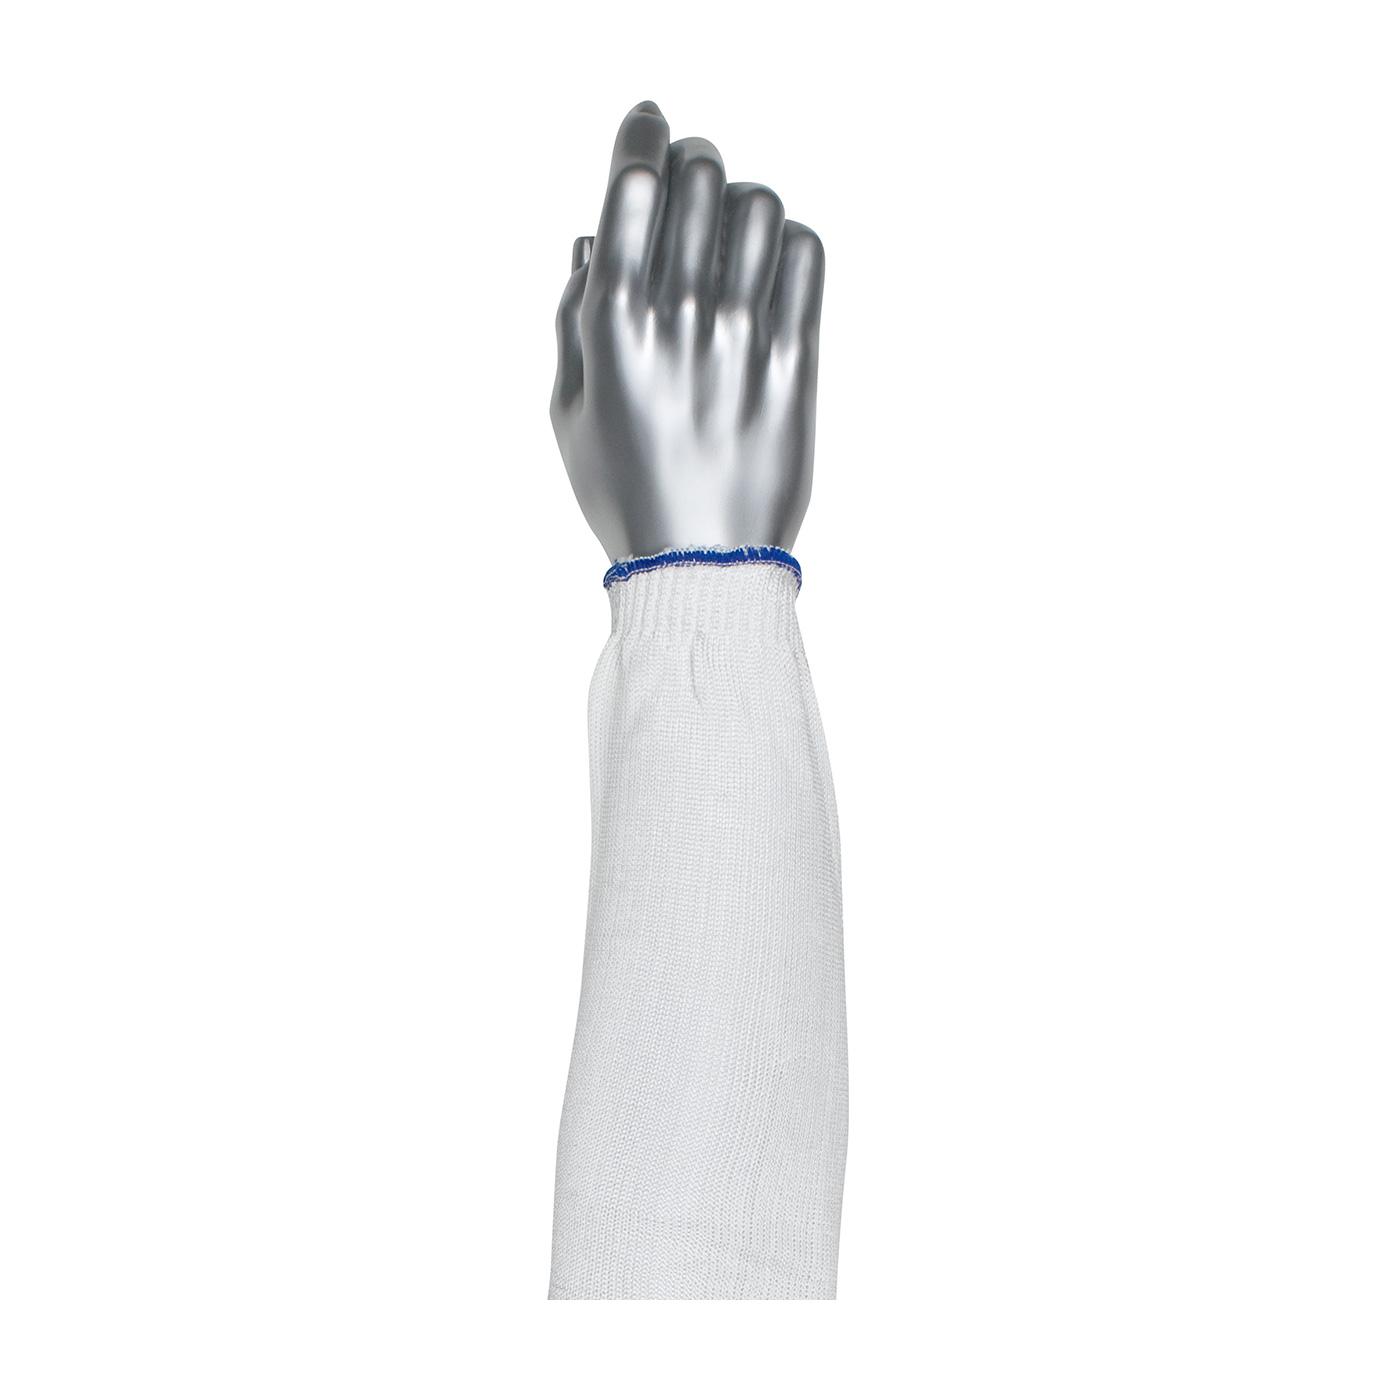 PIP Kut Gard® White Single Ply Seamless Knit Spun Dyneema®/Nylon Blended Sleeve